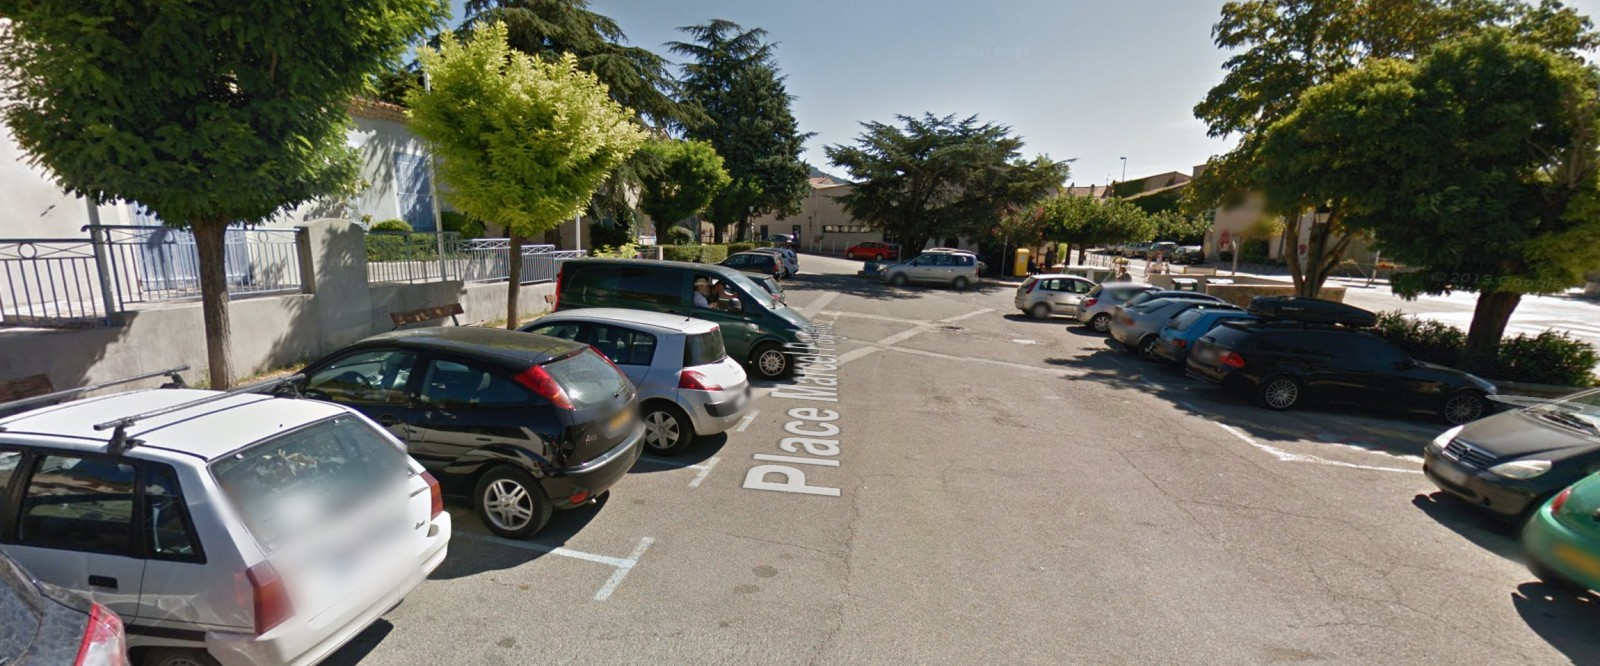 Parking Marcel Pagnol